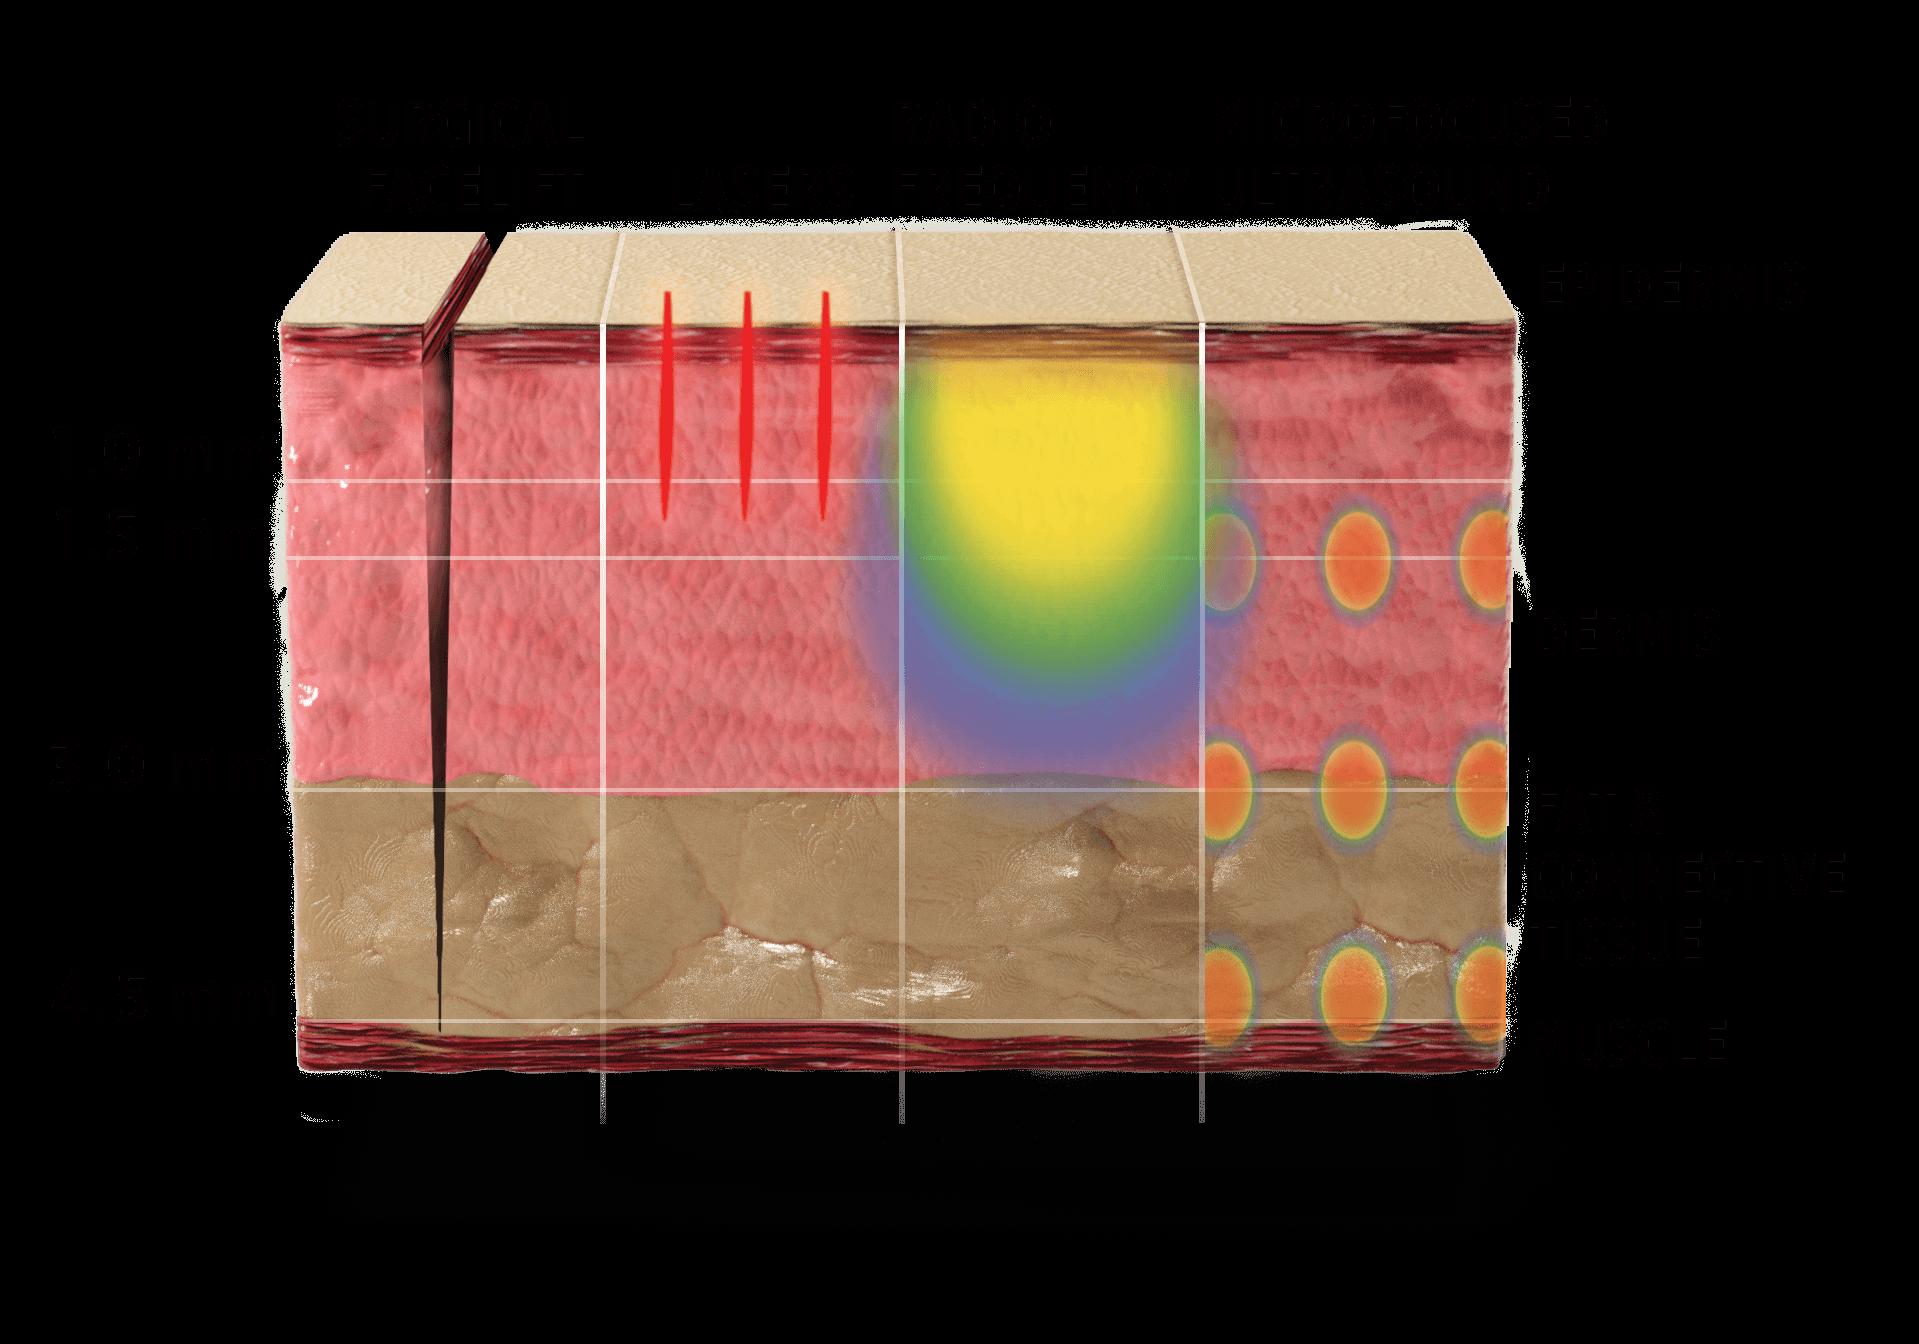 Illustration: Skin layers deep treatment